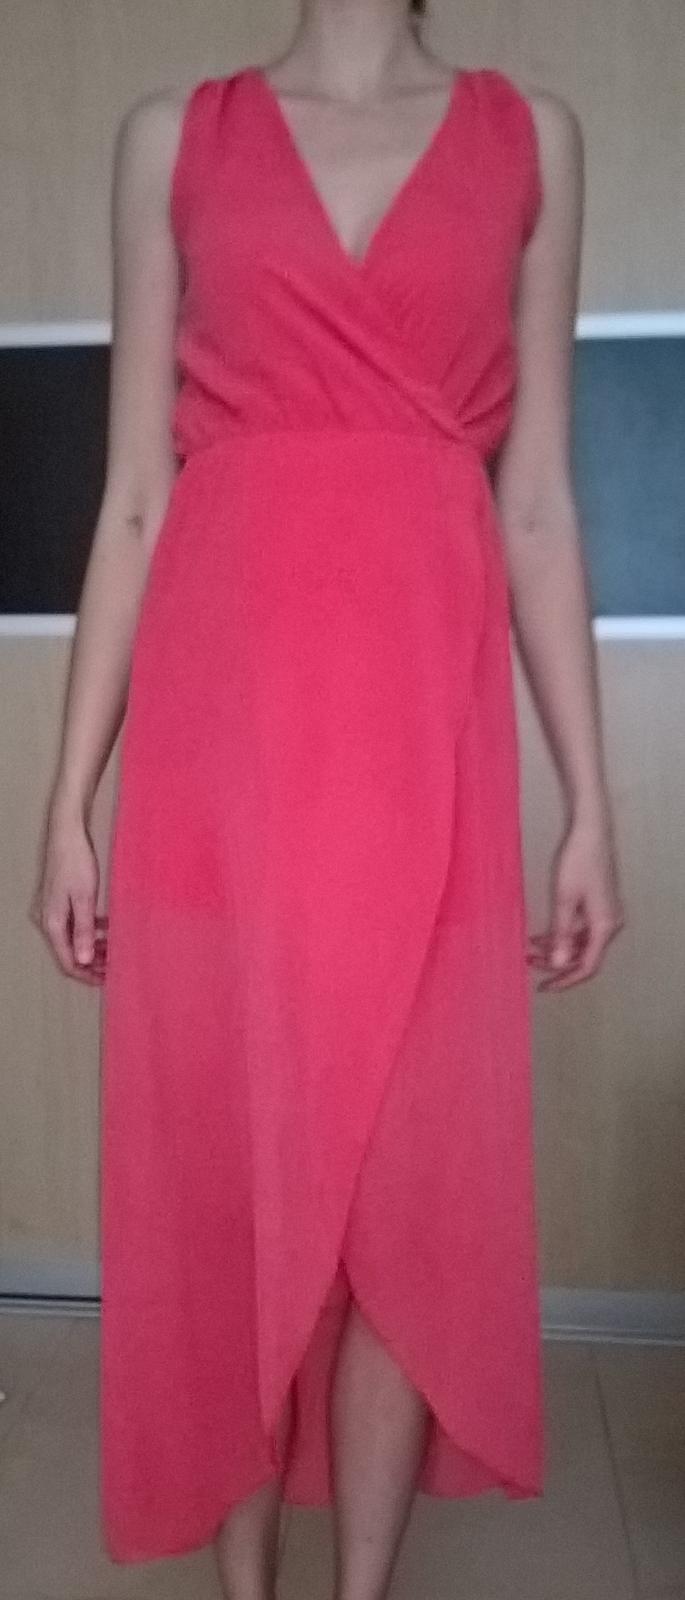 Marhuľkové spoločenské šaty č.36 - 38 412d242d3f6